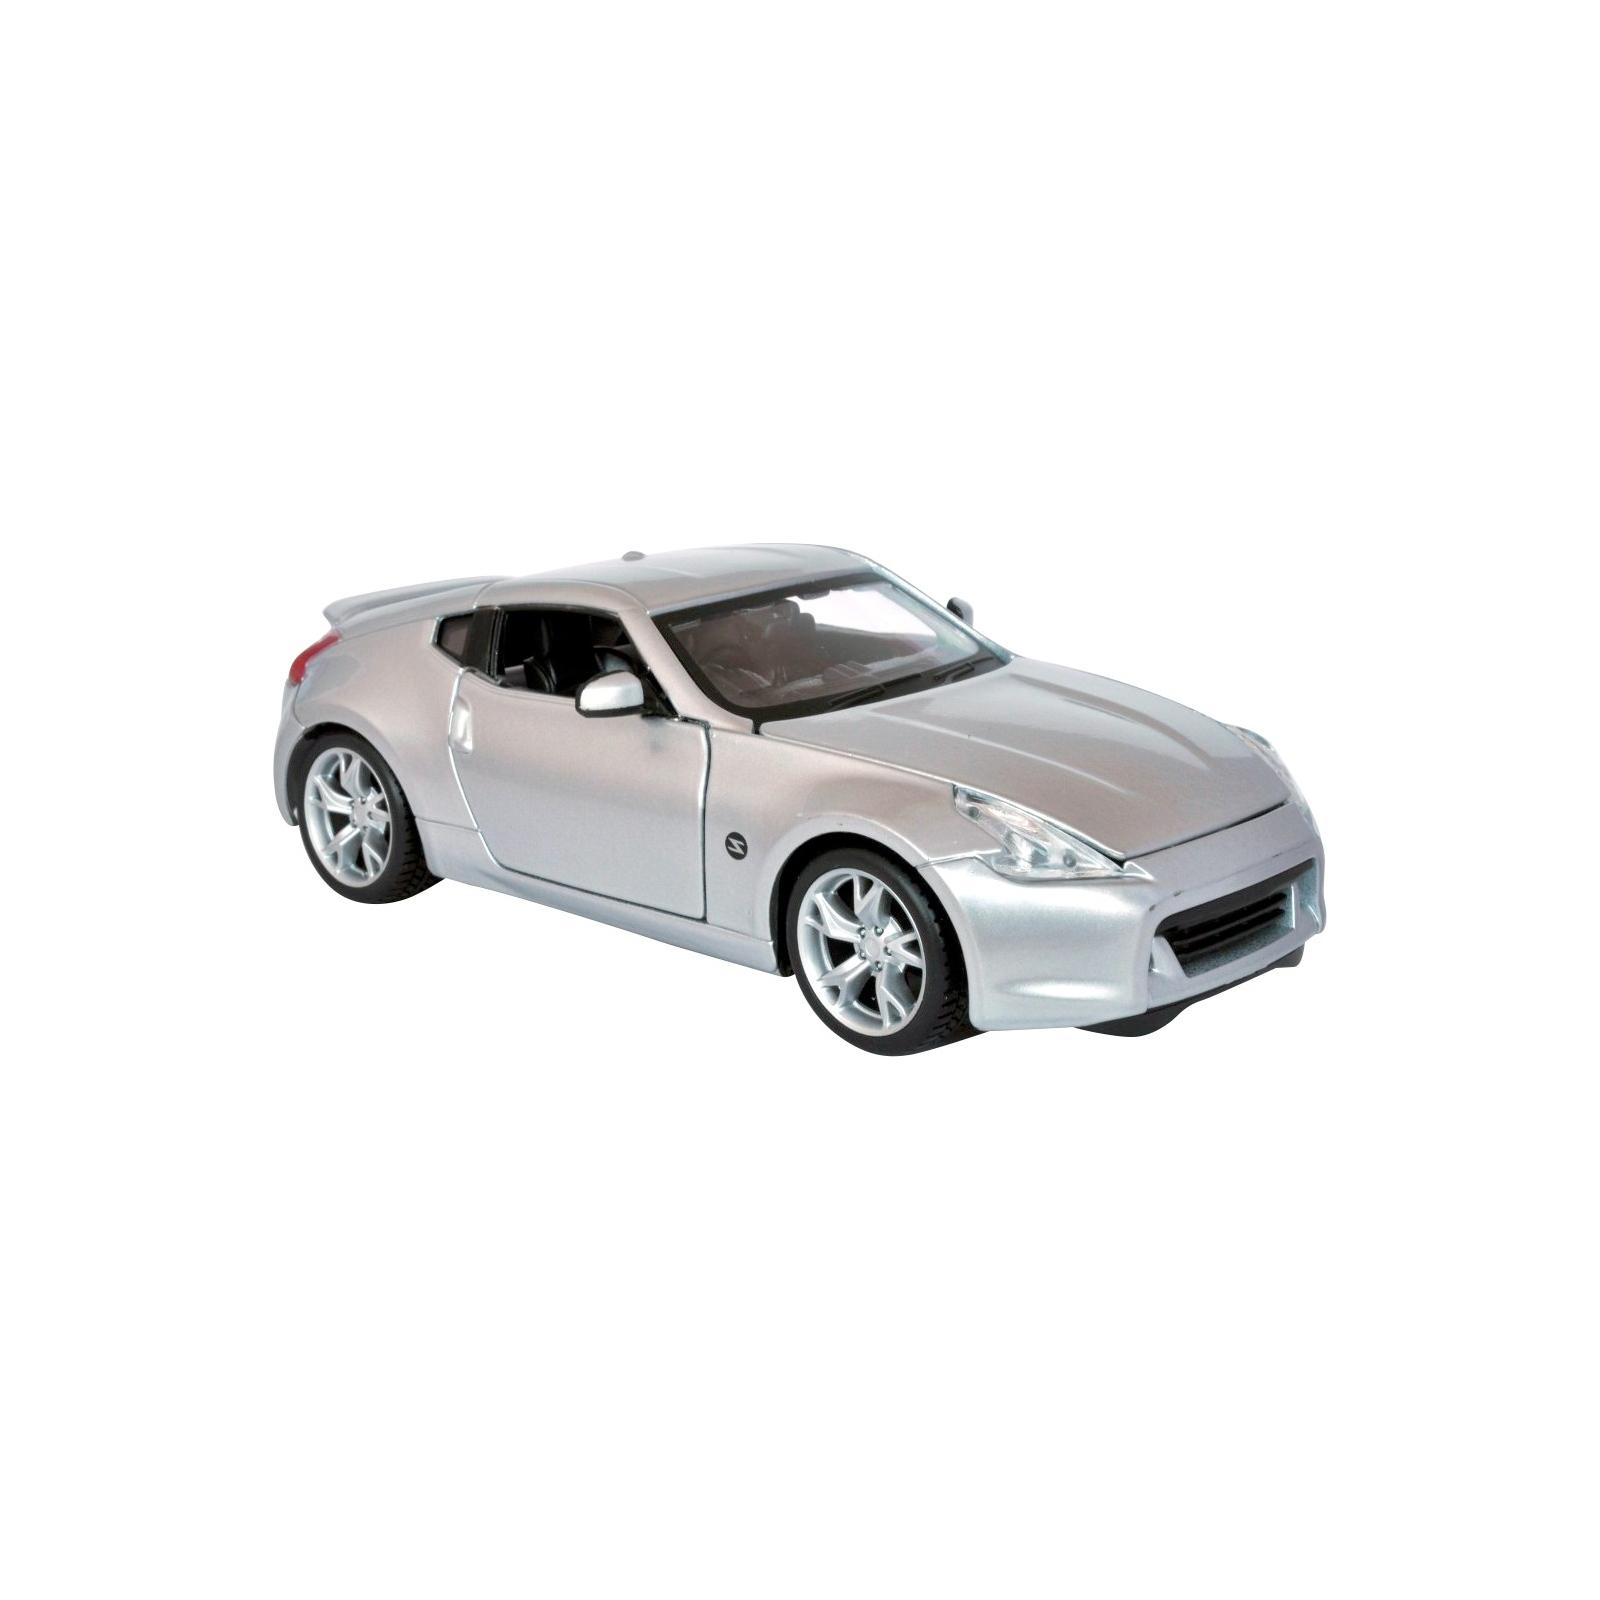 Машина Maisto Nissan 370Z 2009 (1:24) серебристый (31200 silver)